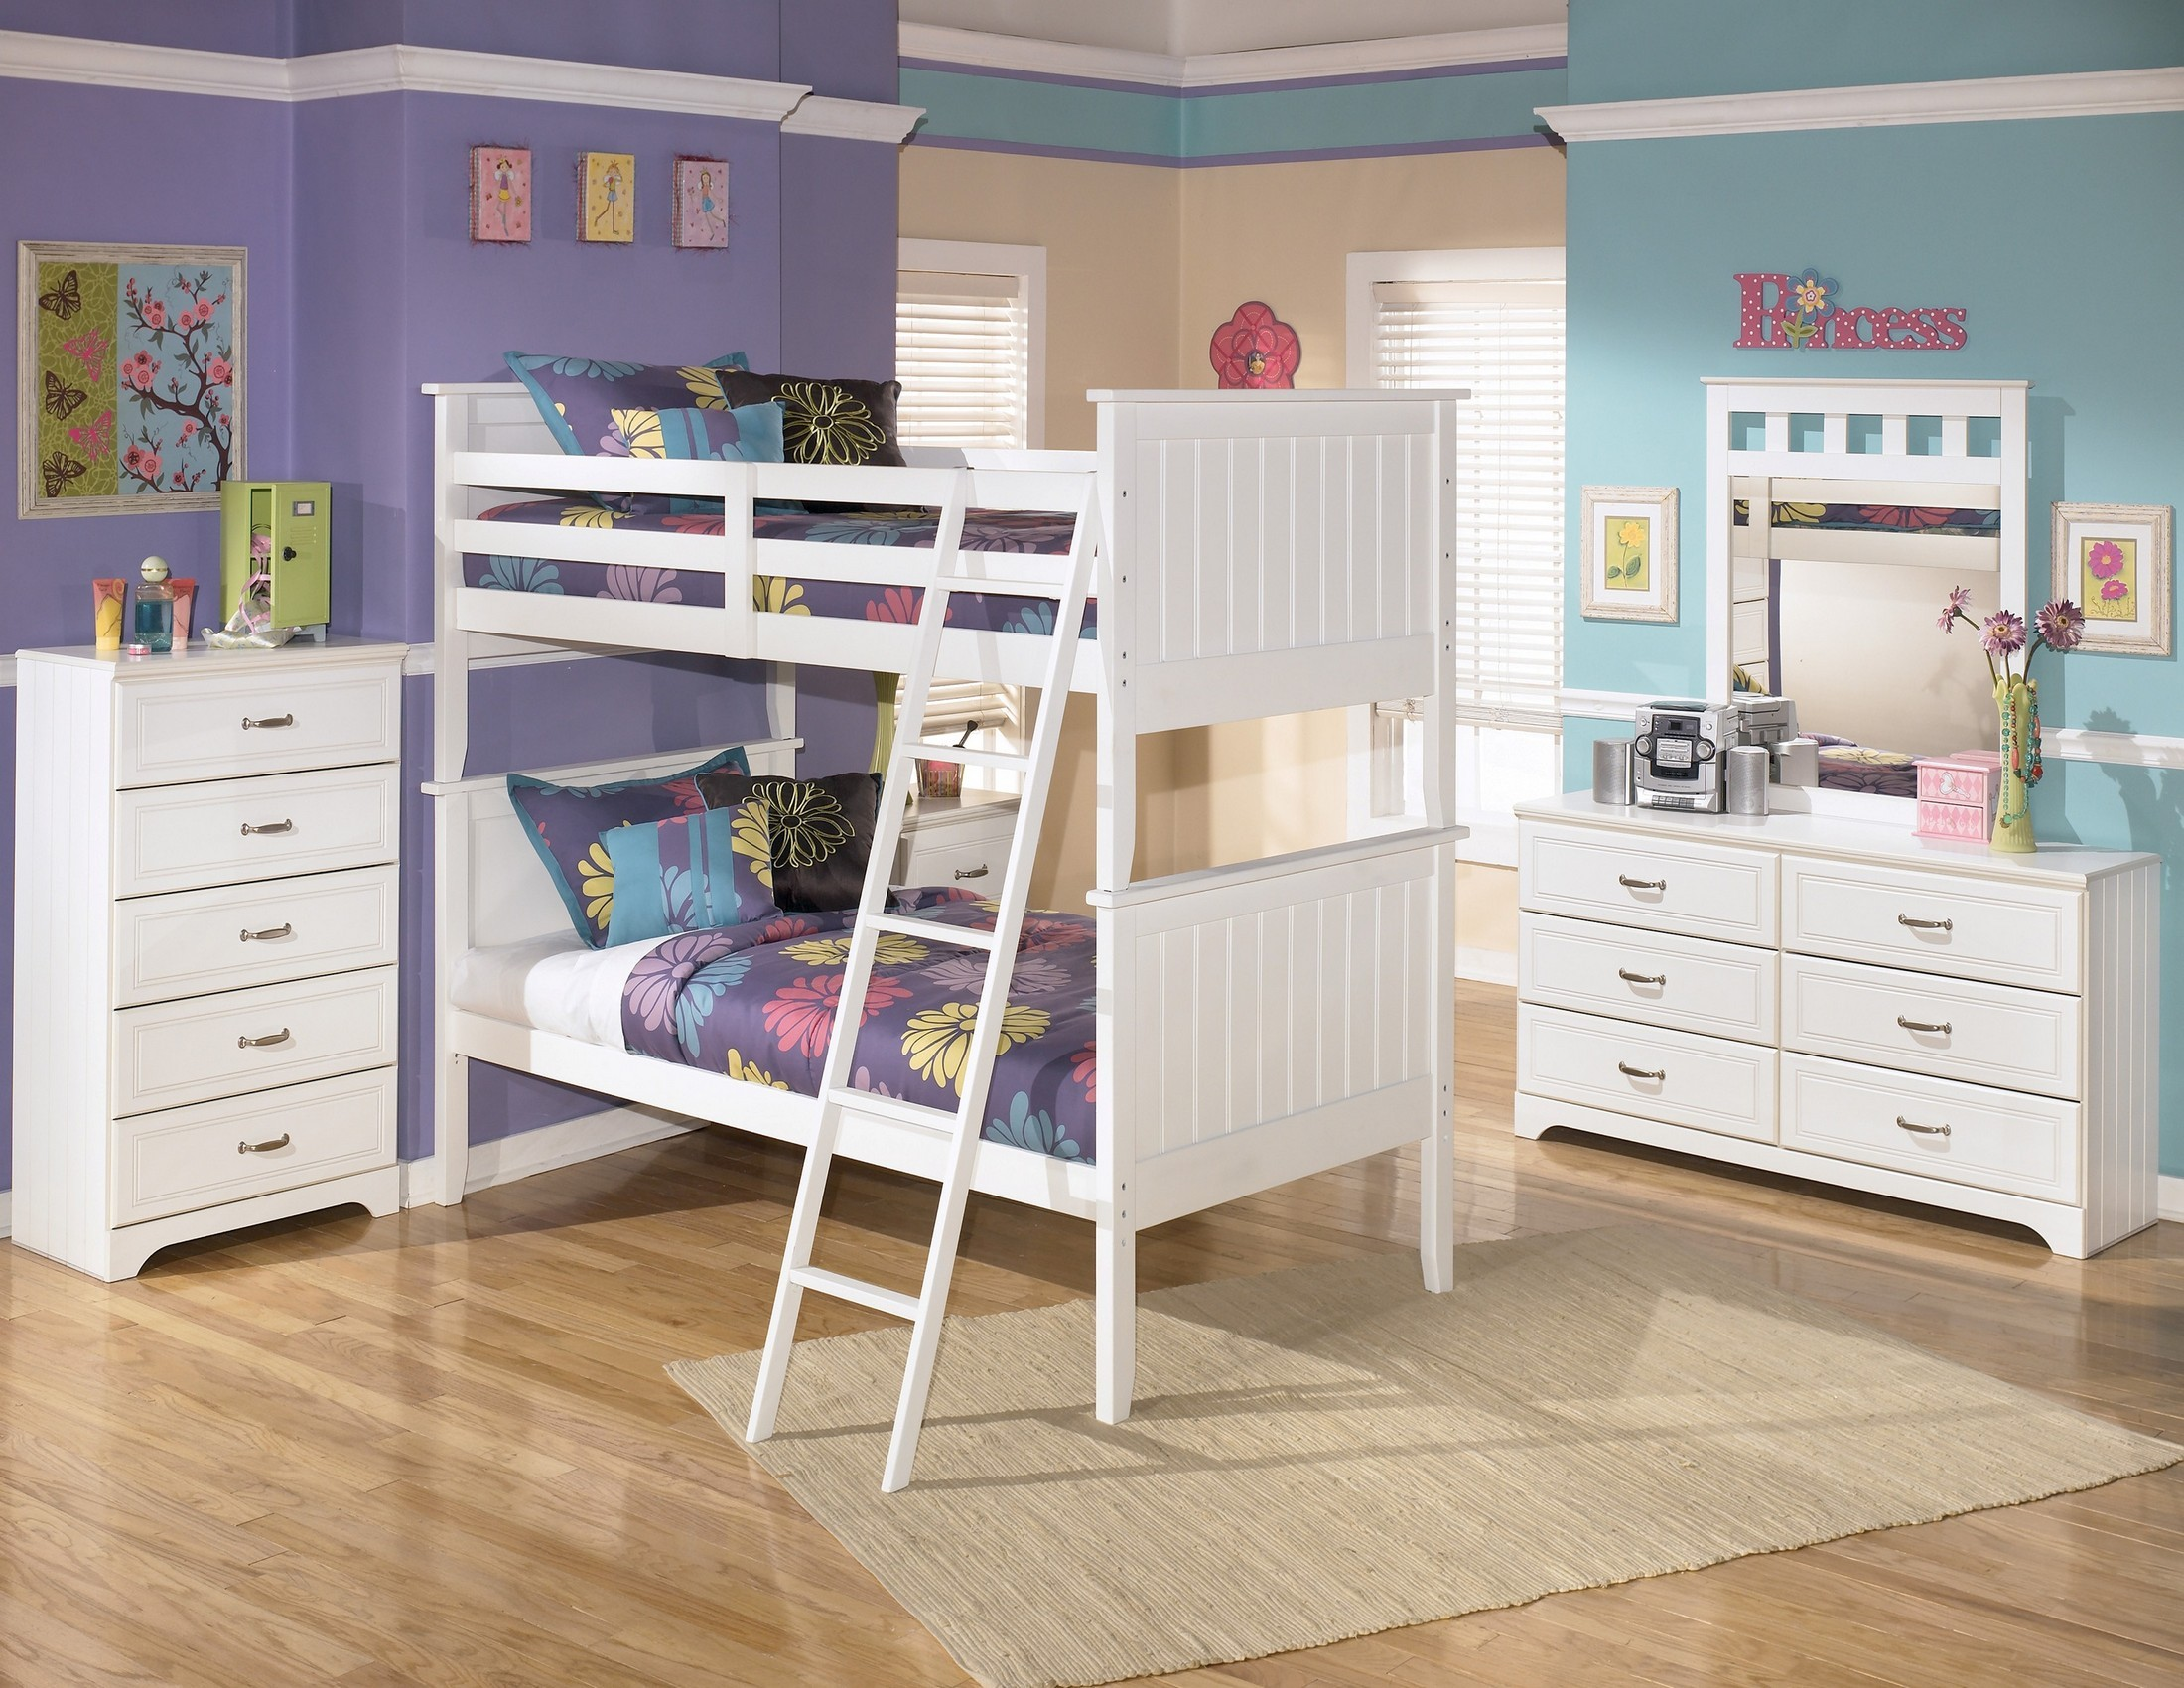 Lulu Bunk Bedroom Set From Ashley (B102-59)